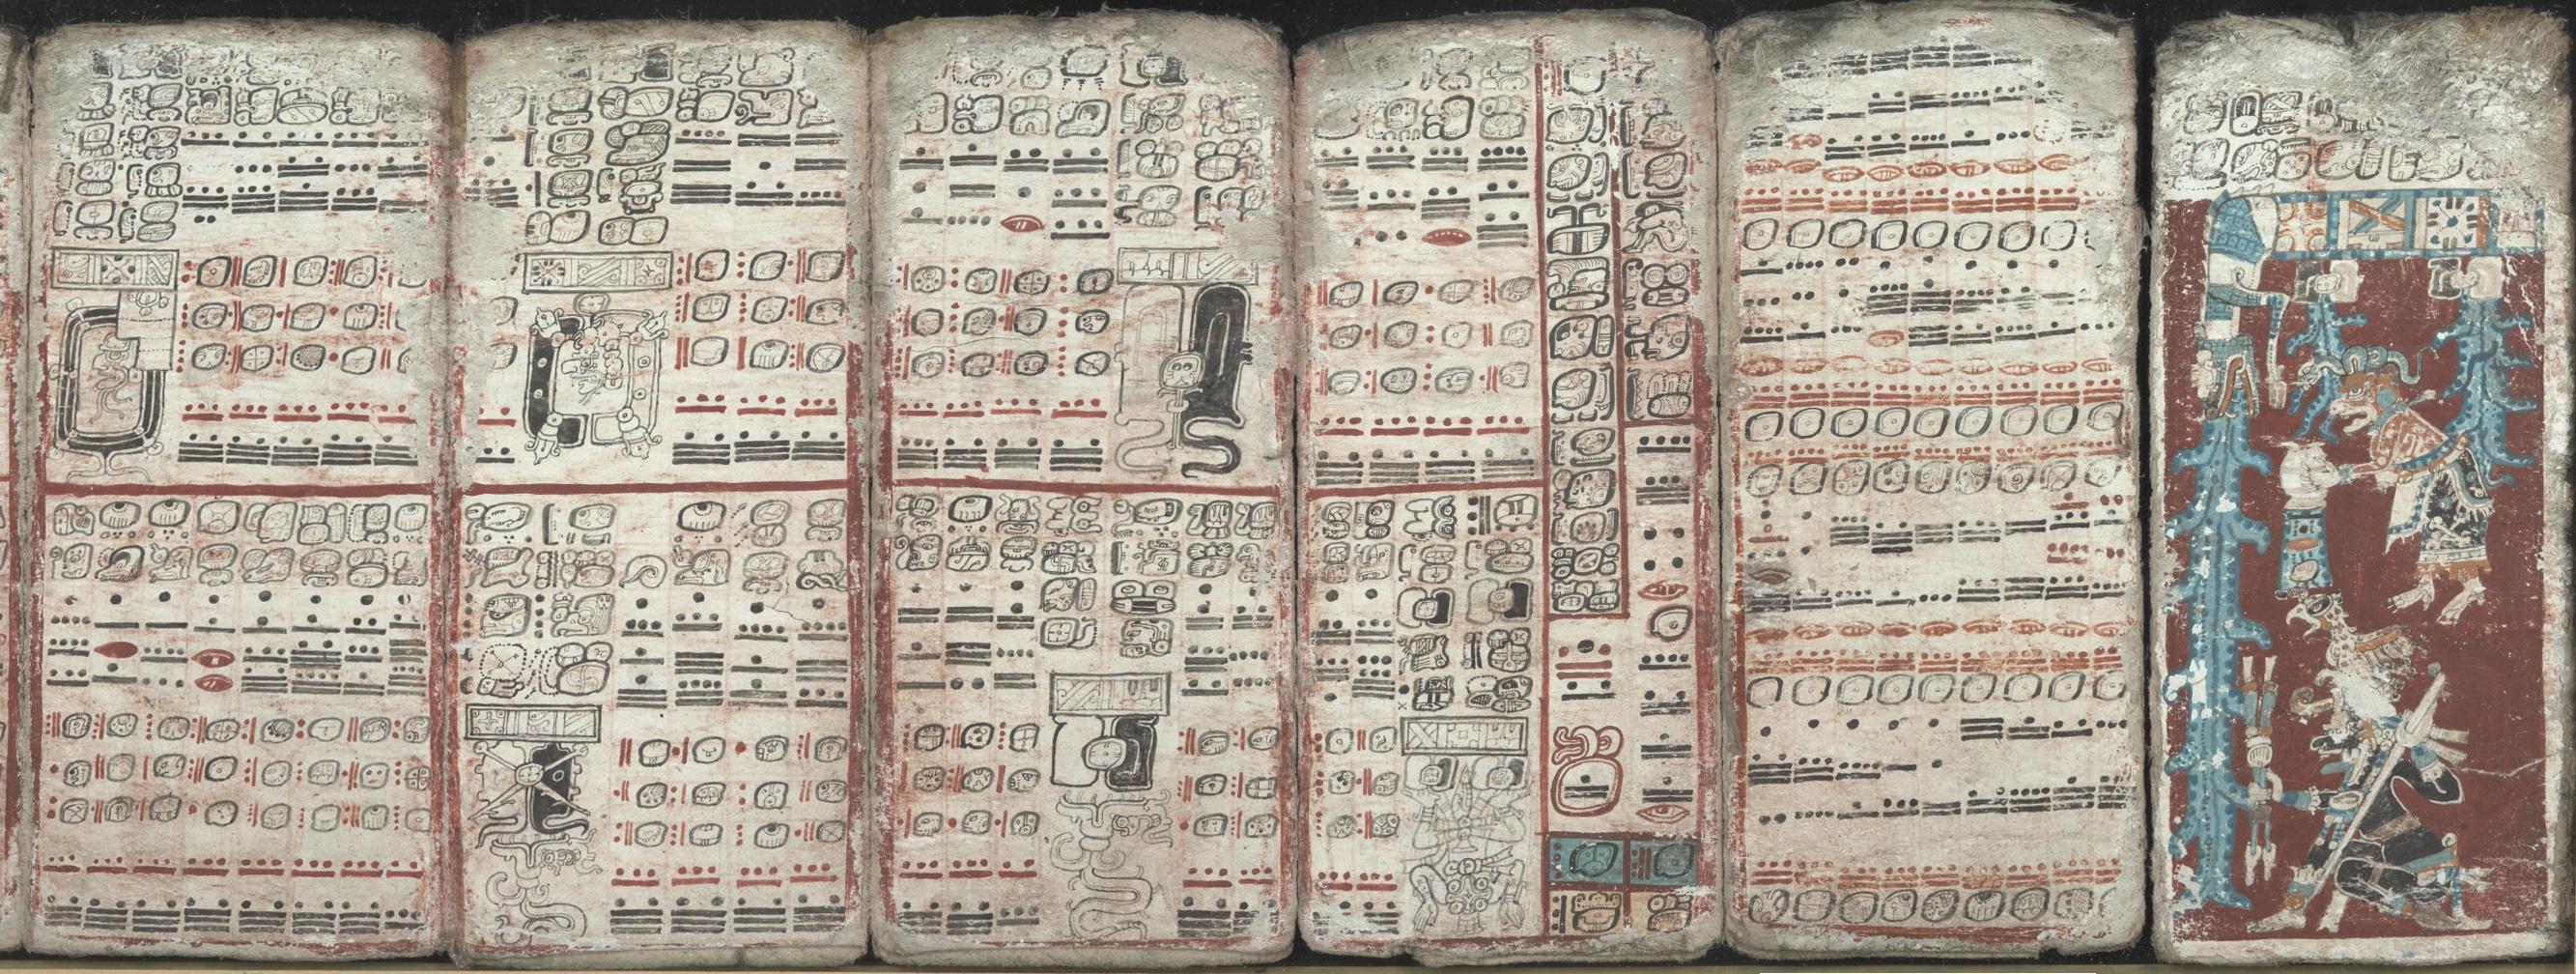 Dresden_Codex_pp.58-62_78.jpg